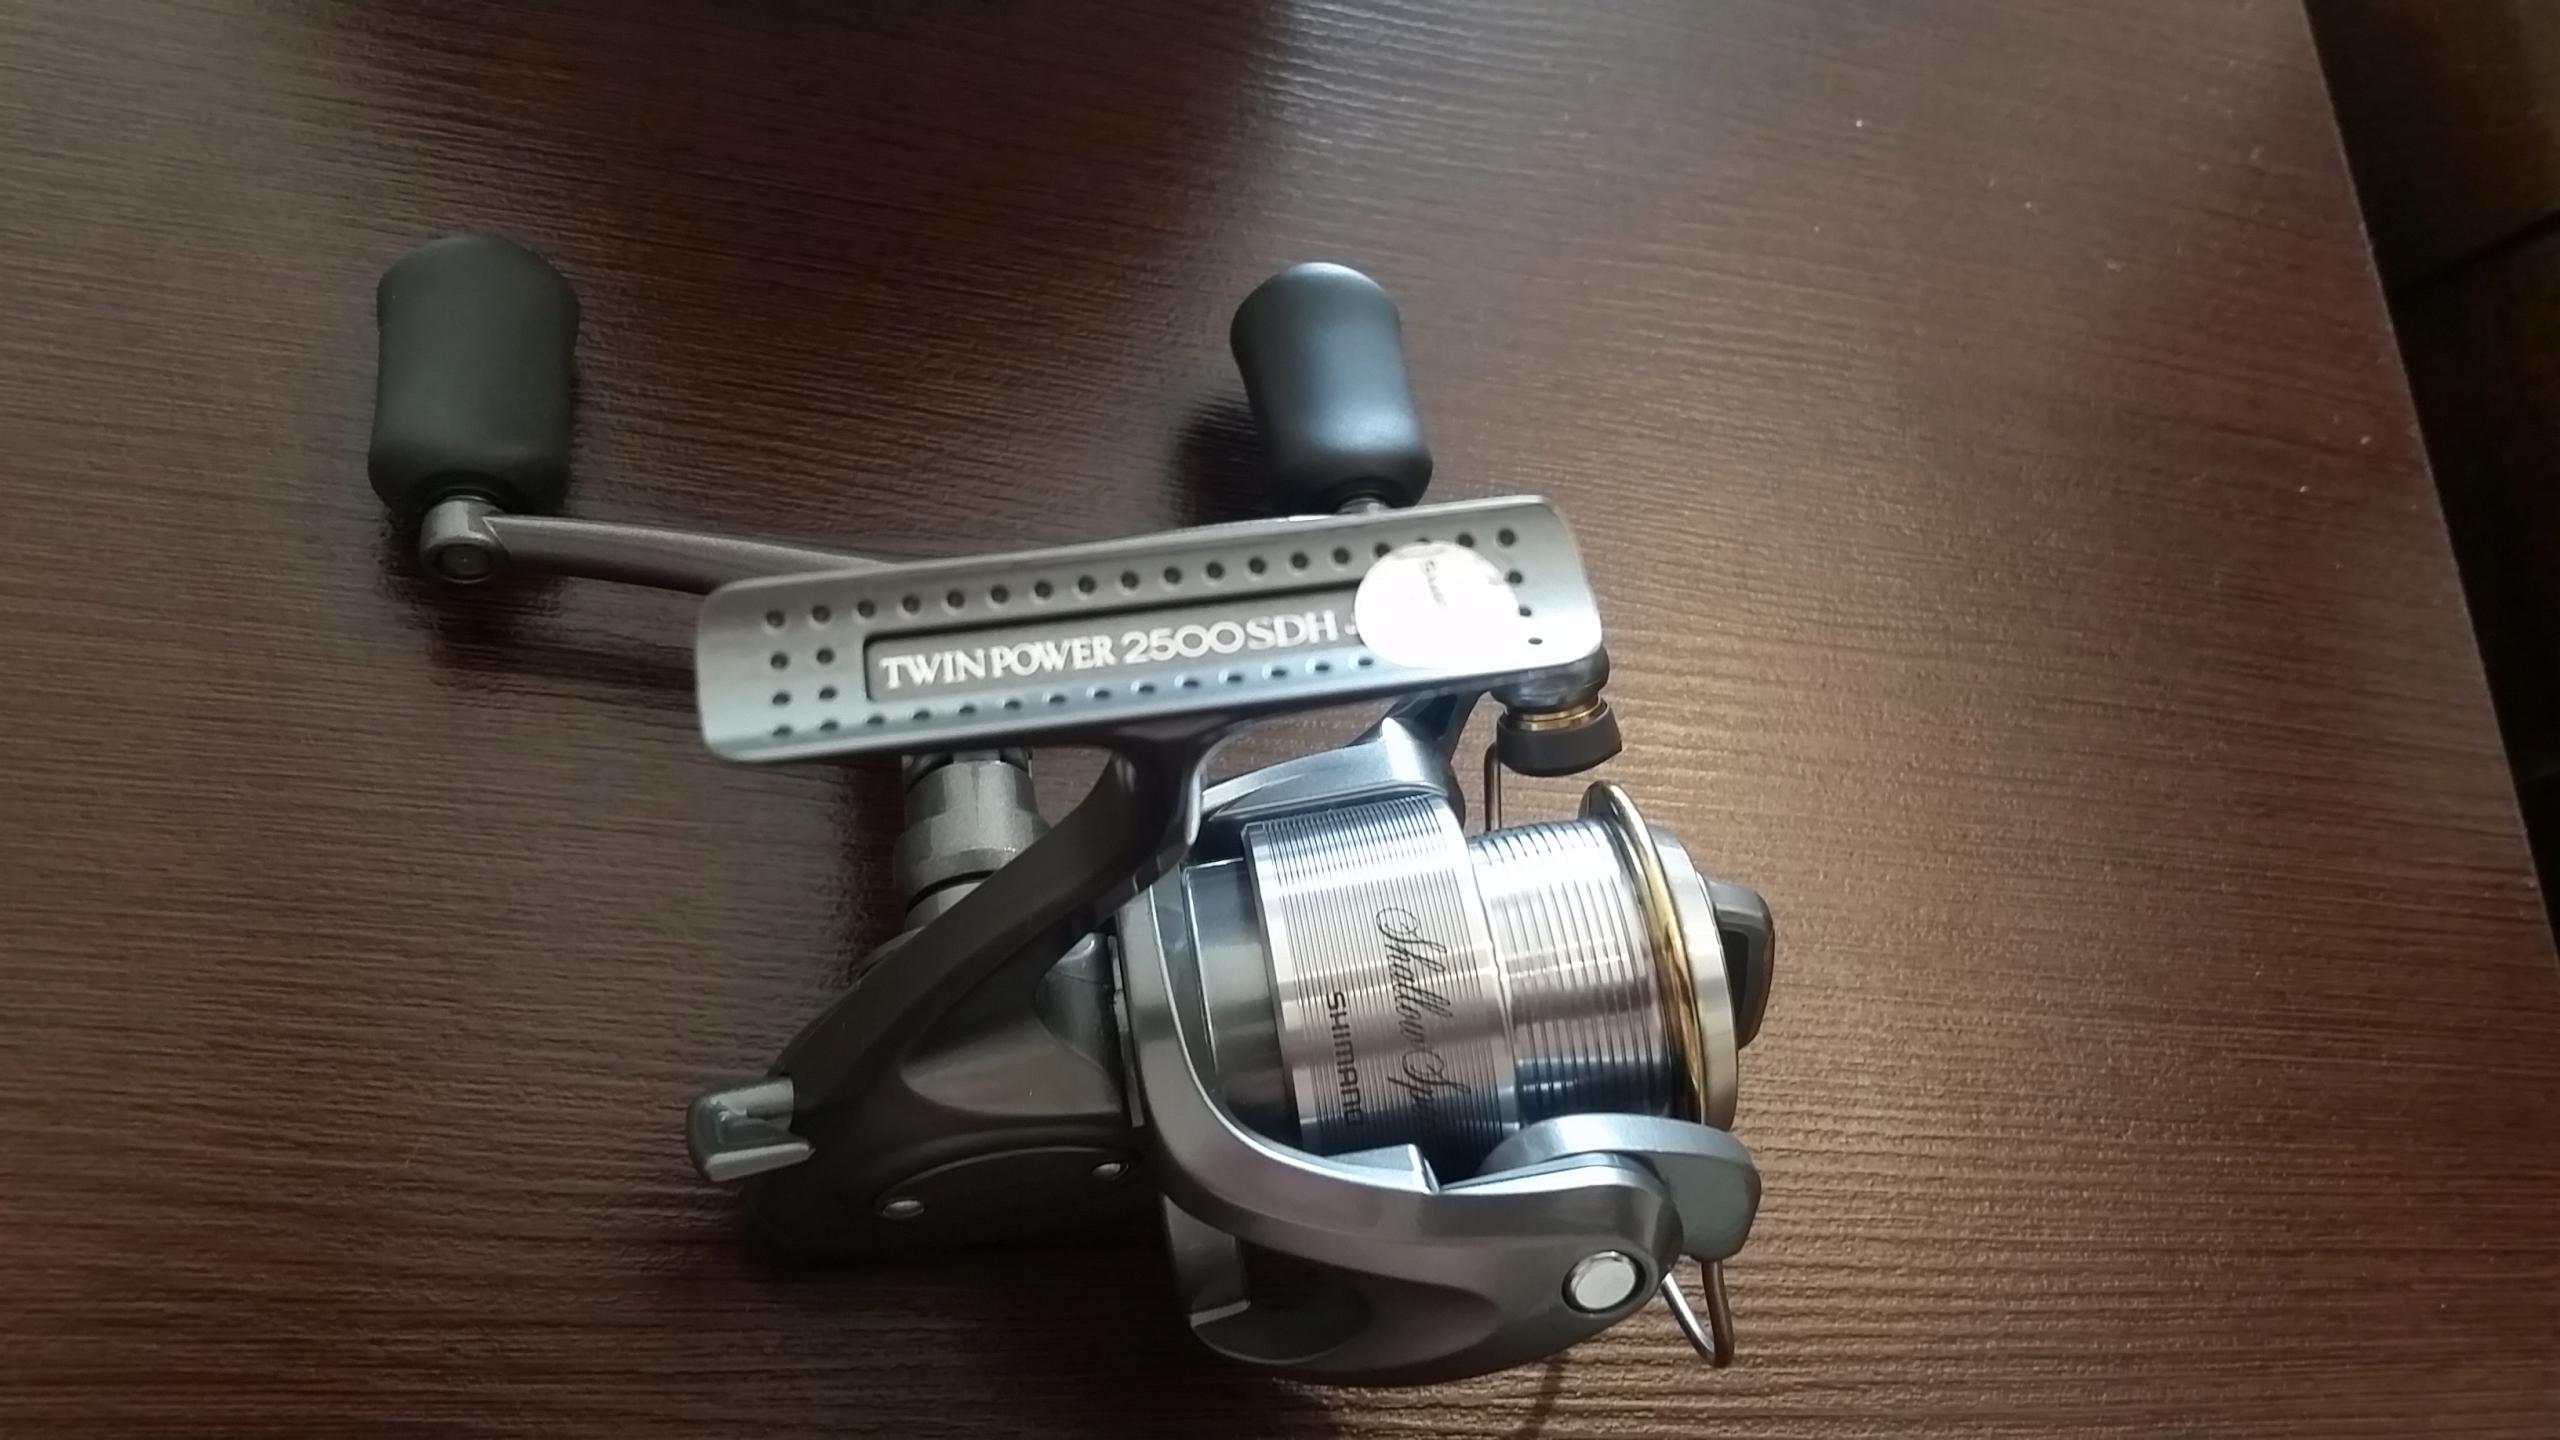 Shimano 98 twin power 2500sdh